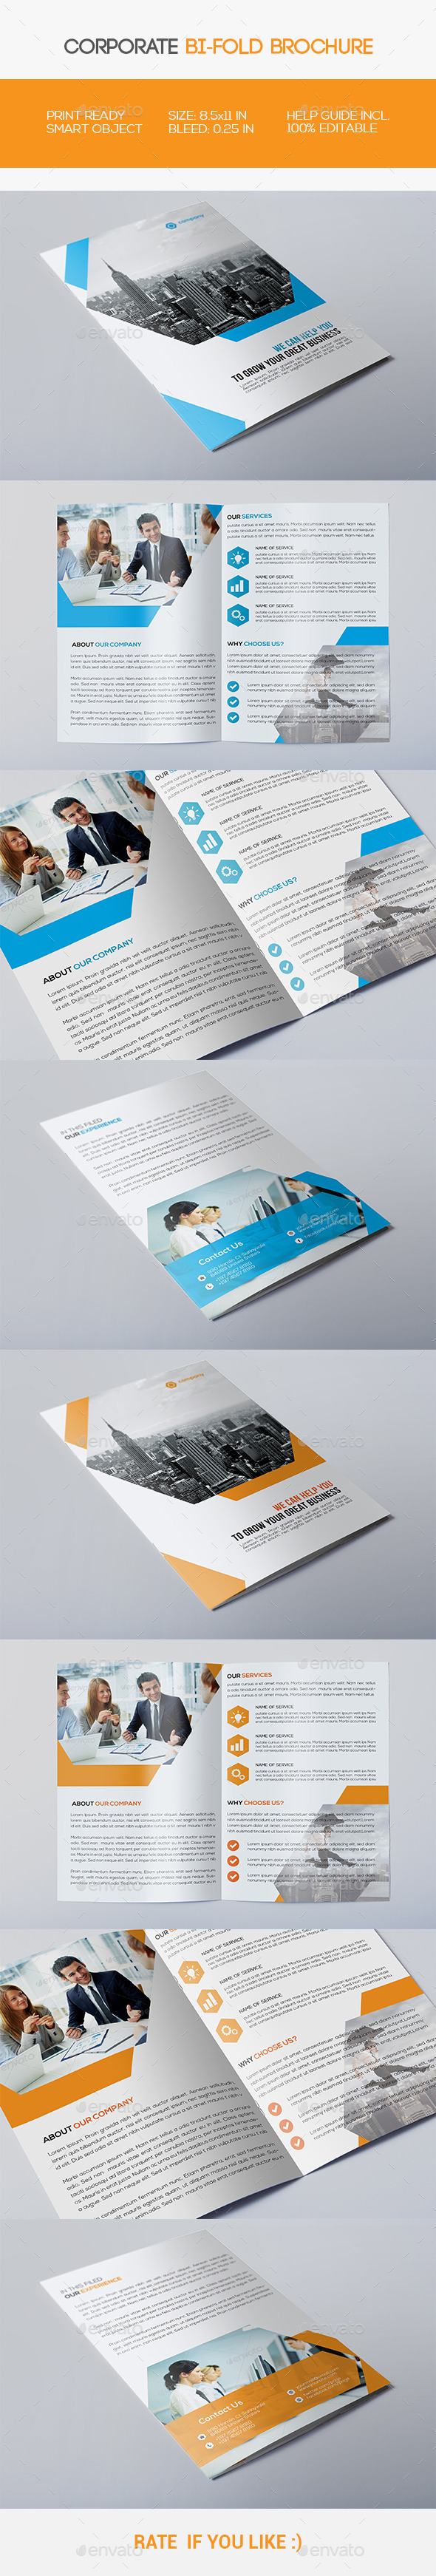 GraphicRiver Corporate Bi-fold Brochure 11533072